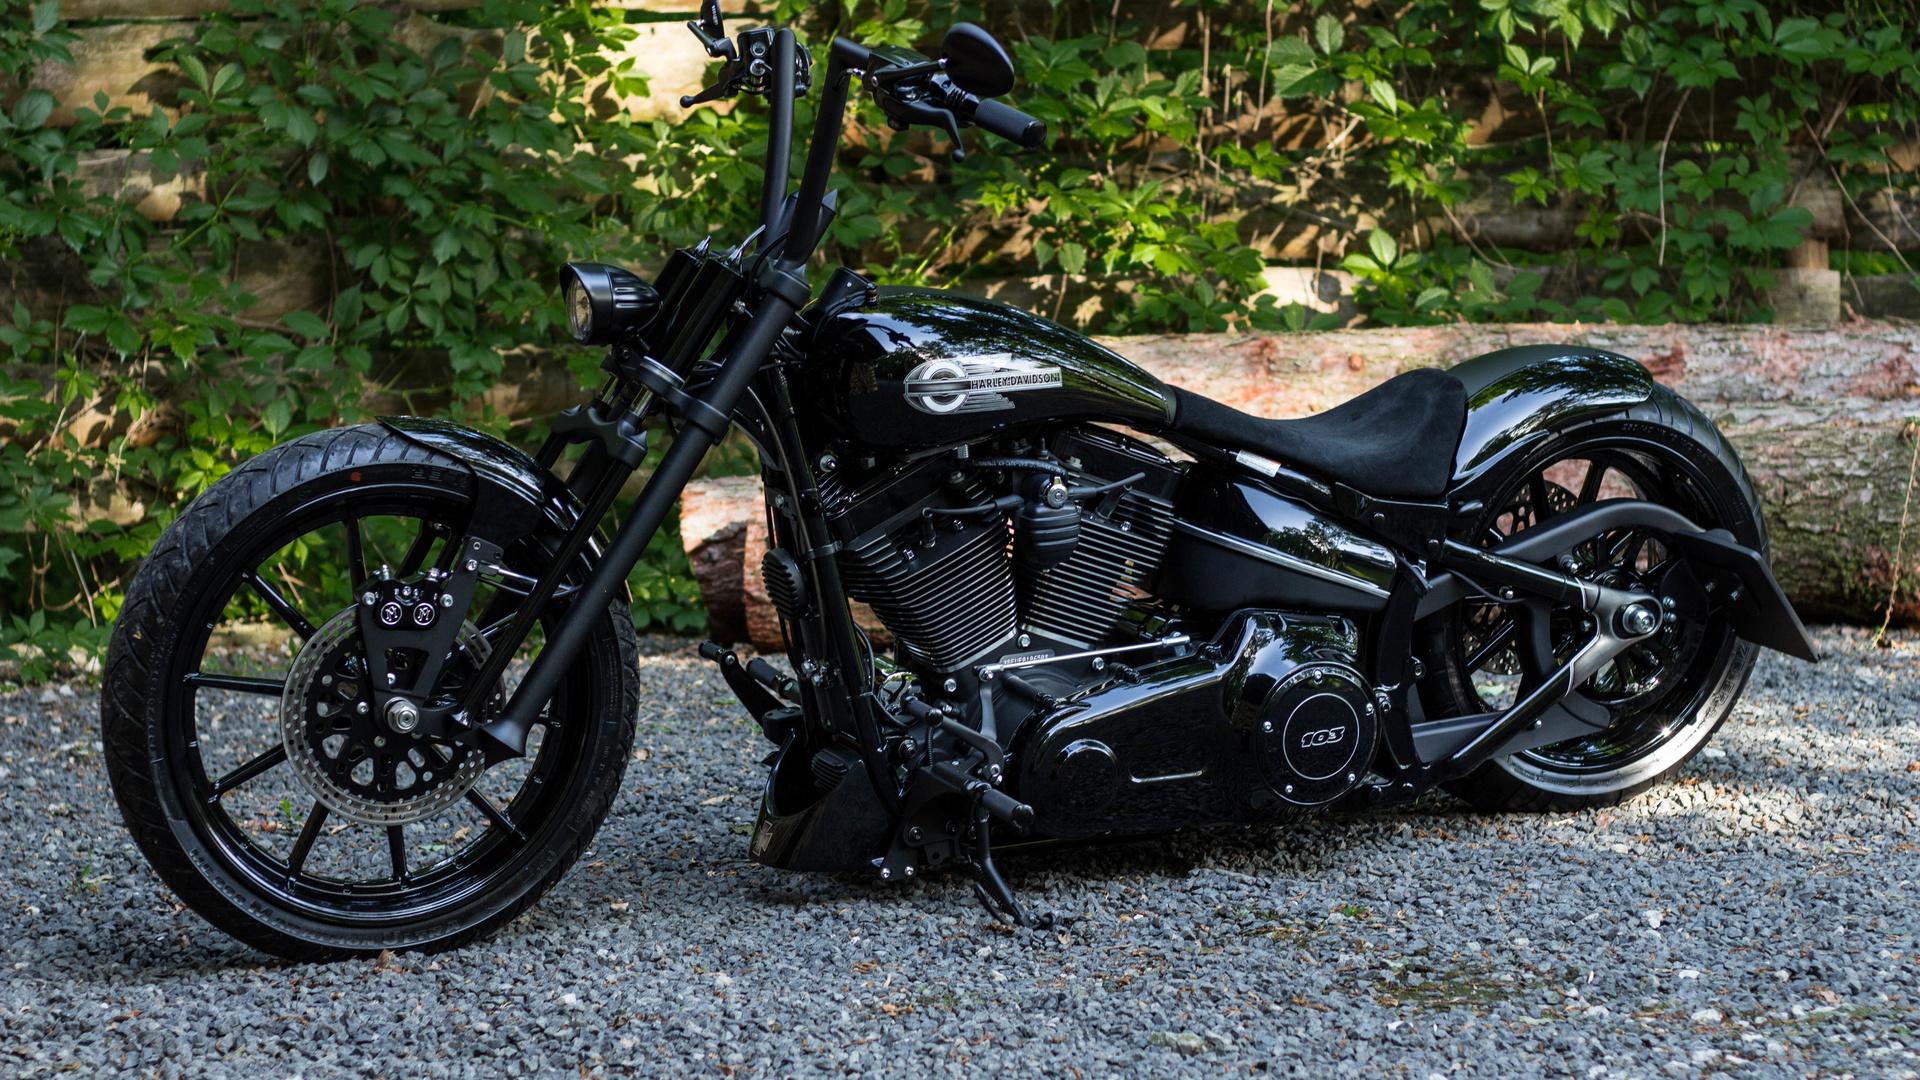 harley-davidson, btchoppers, черный, мотоцикл